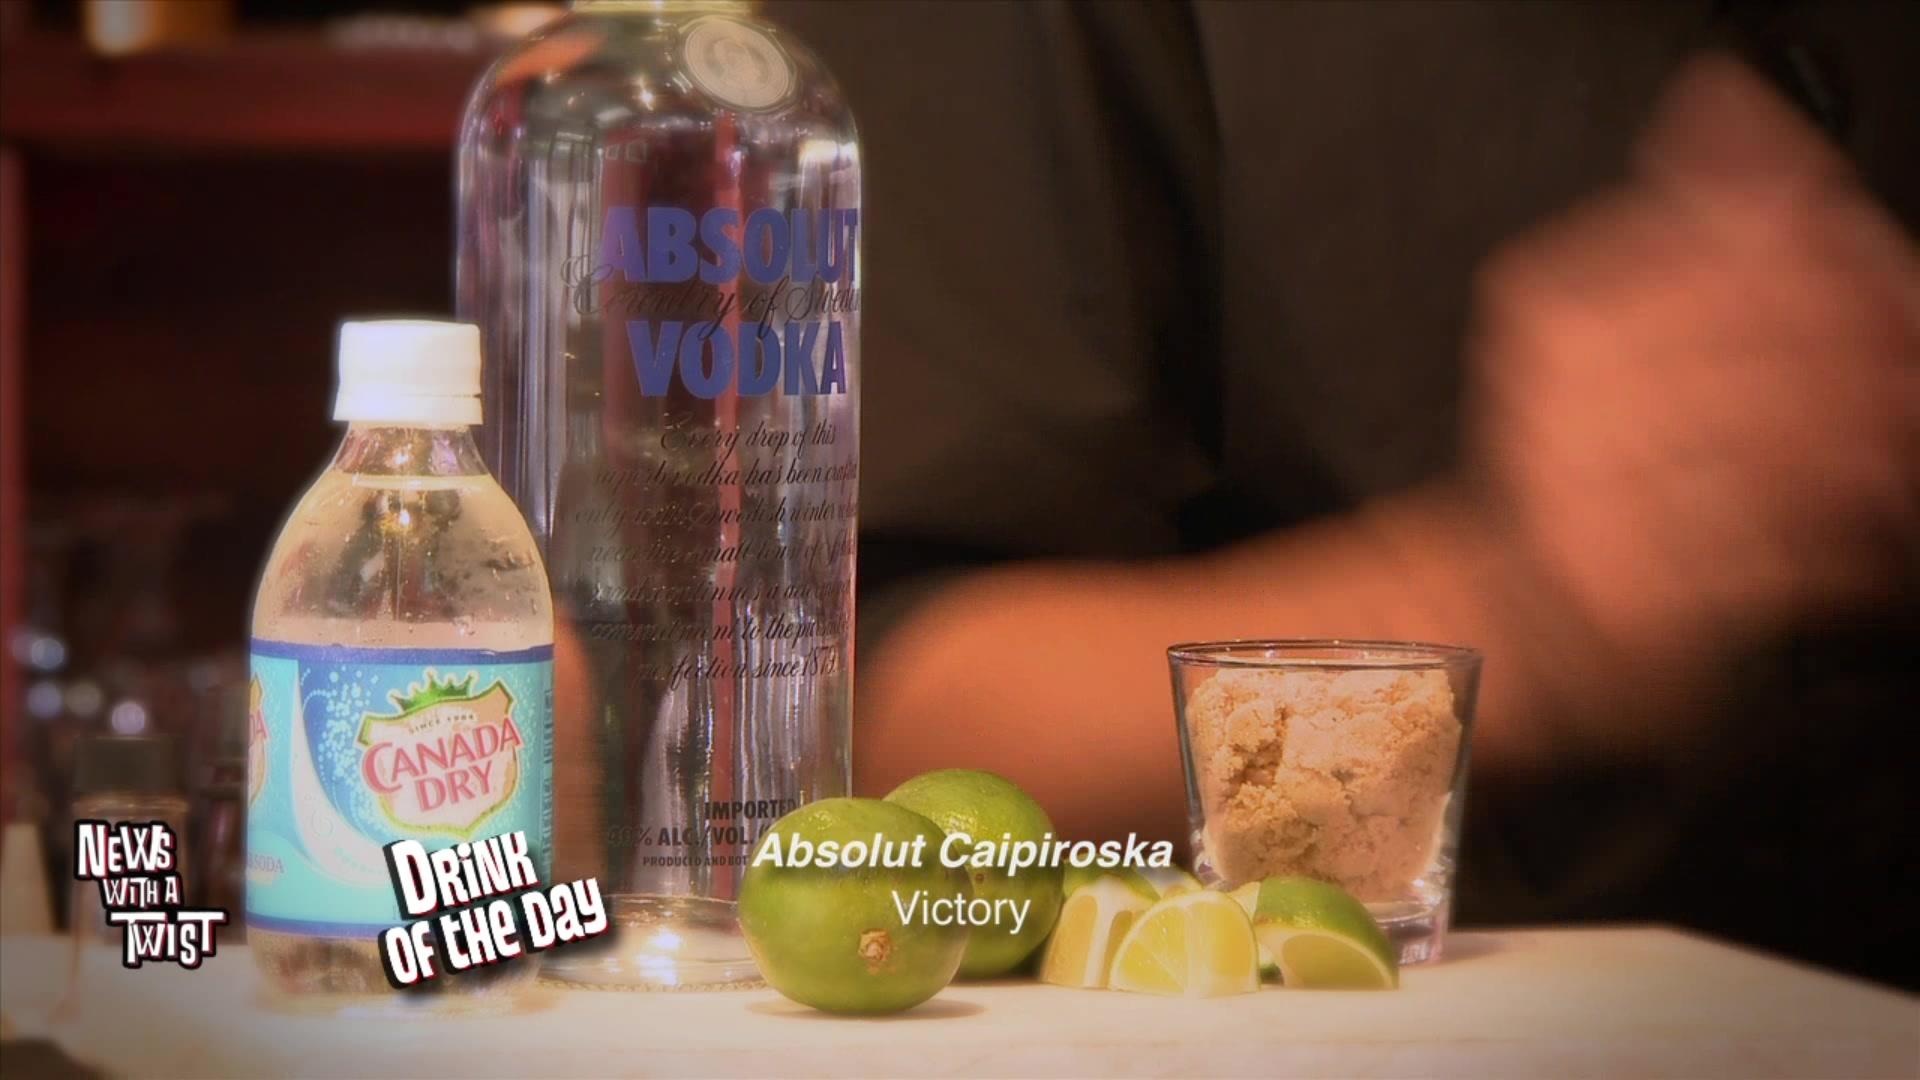 Drink Of The Day: Absolut Caipiroska